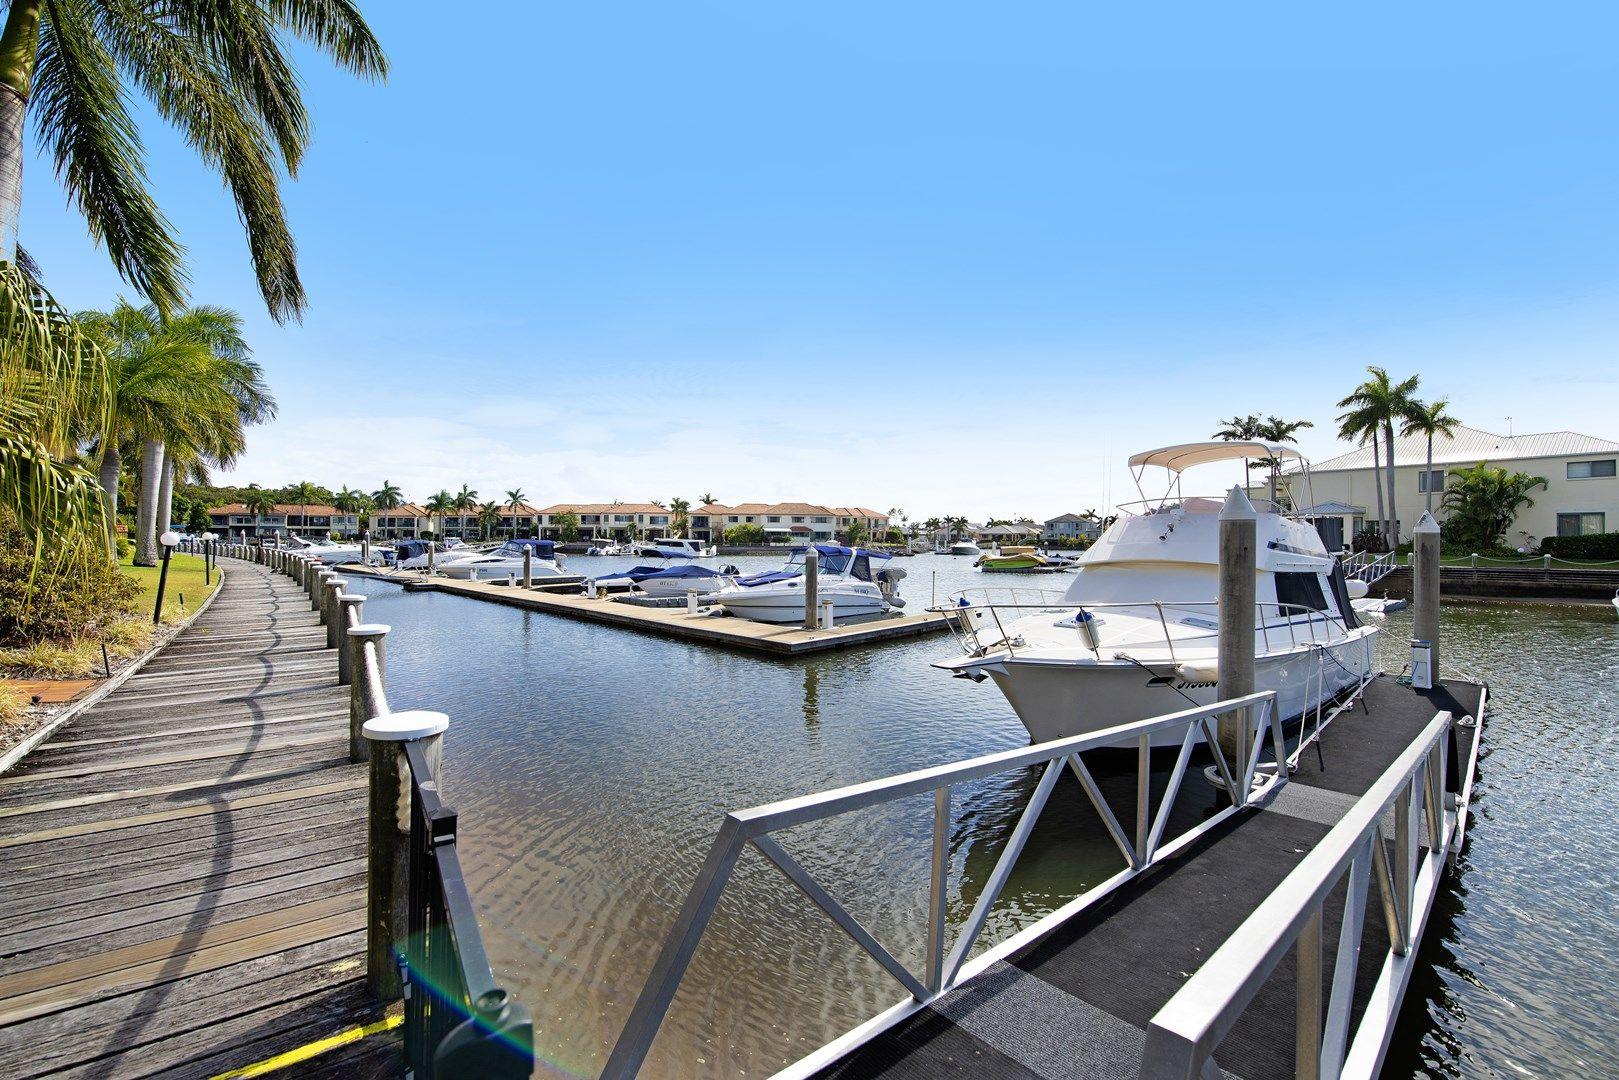 14/41A Broadwater Street, Runaway Bay QLD 4216, Image 0